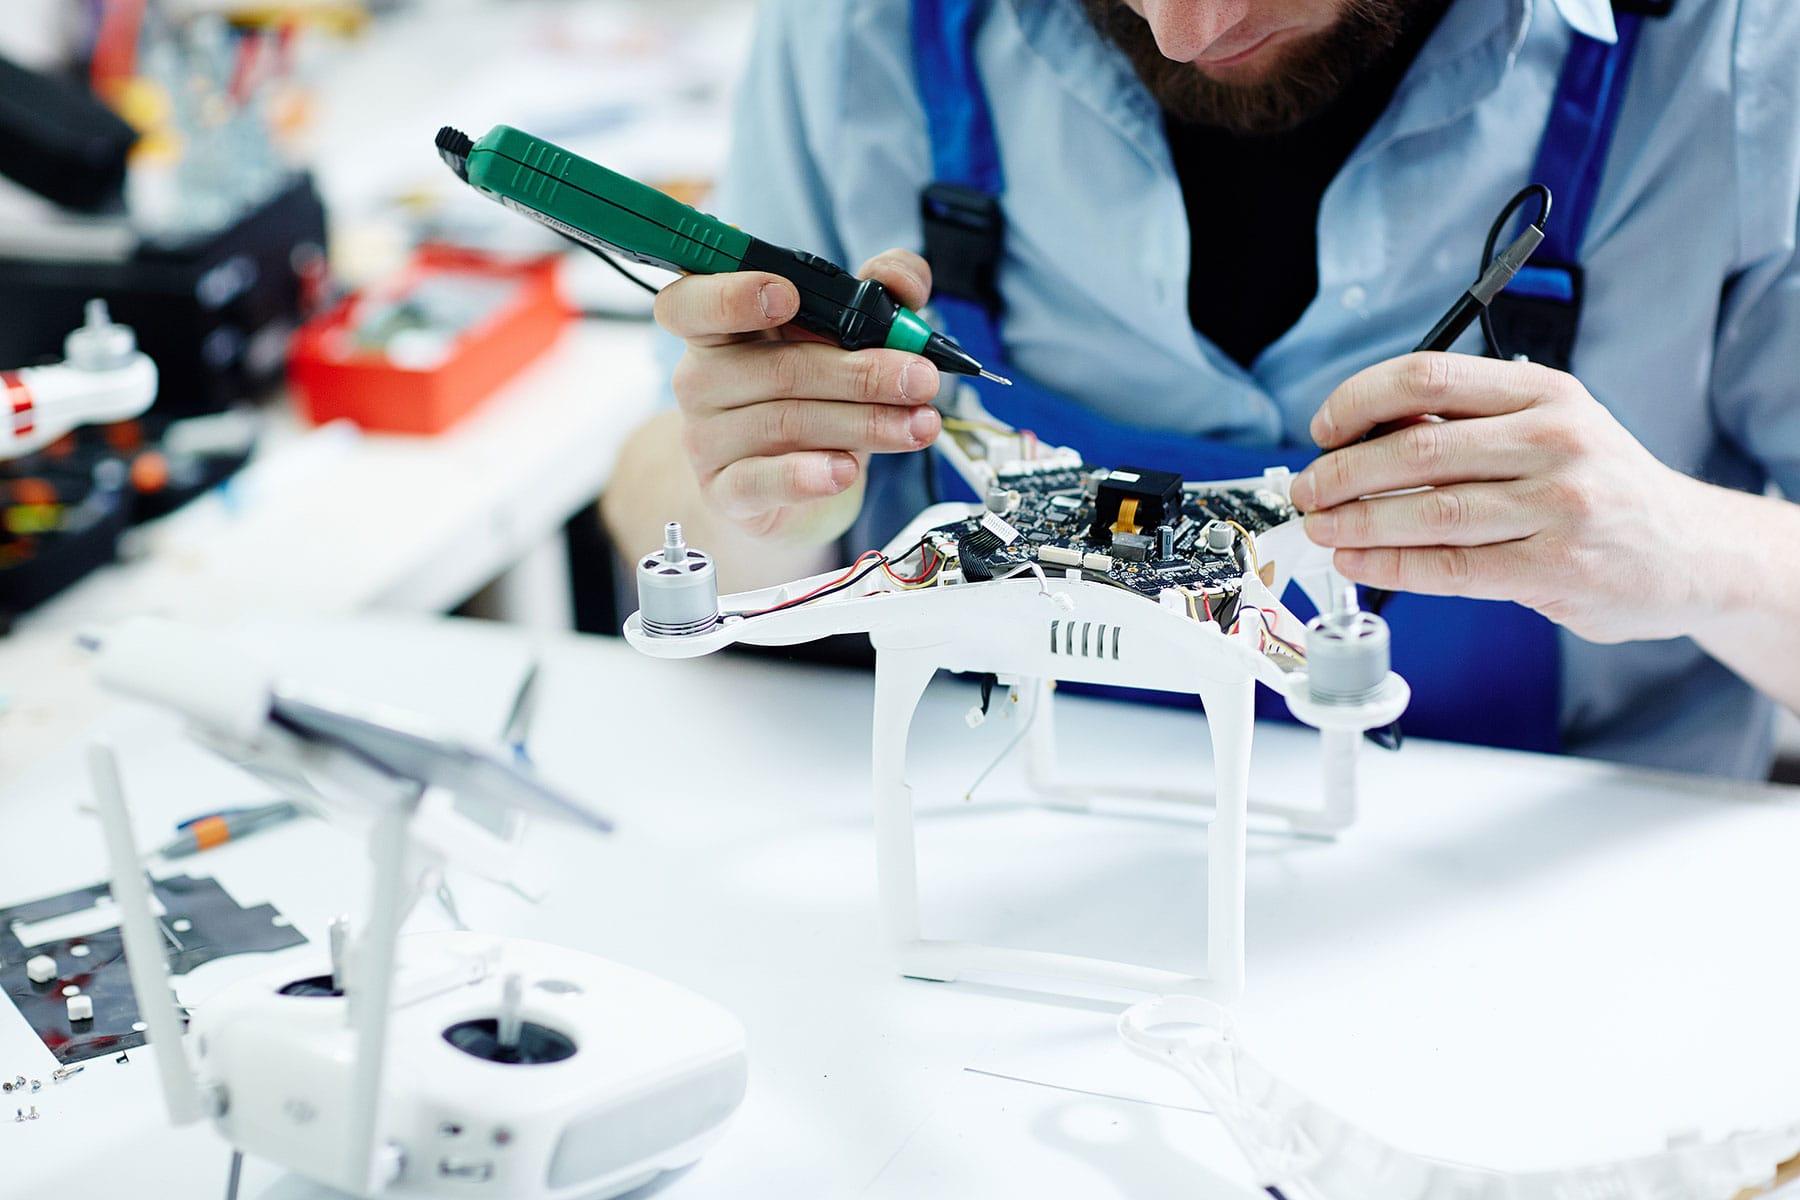 Drone Repair Services